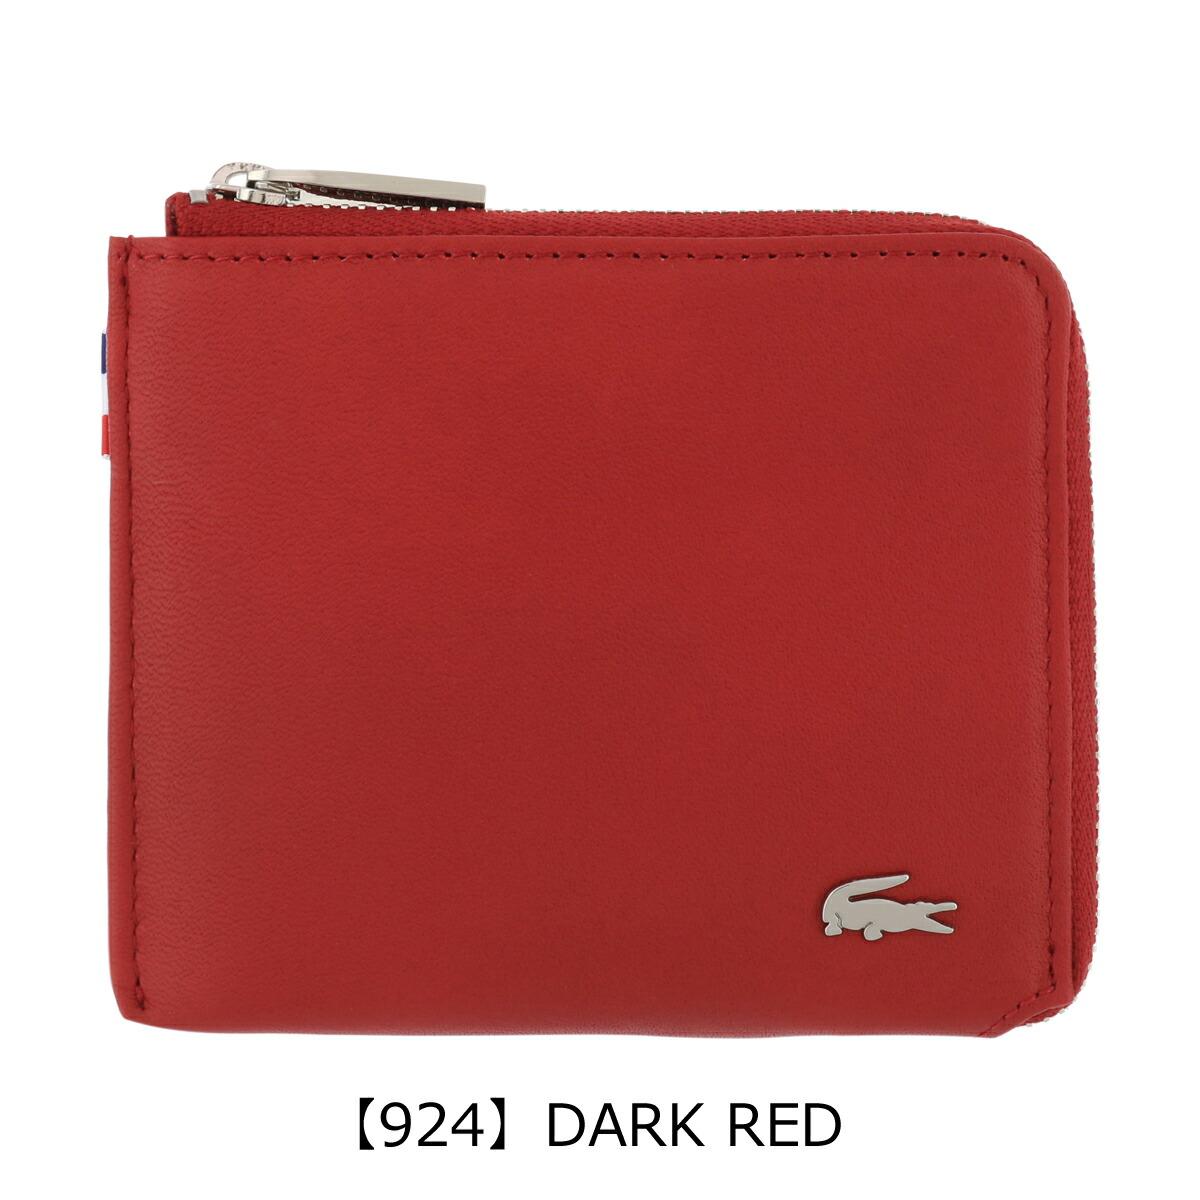 【924】DARK RED